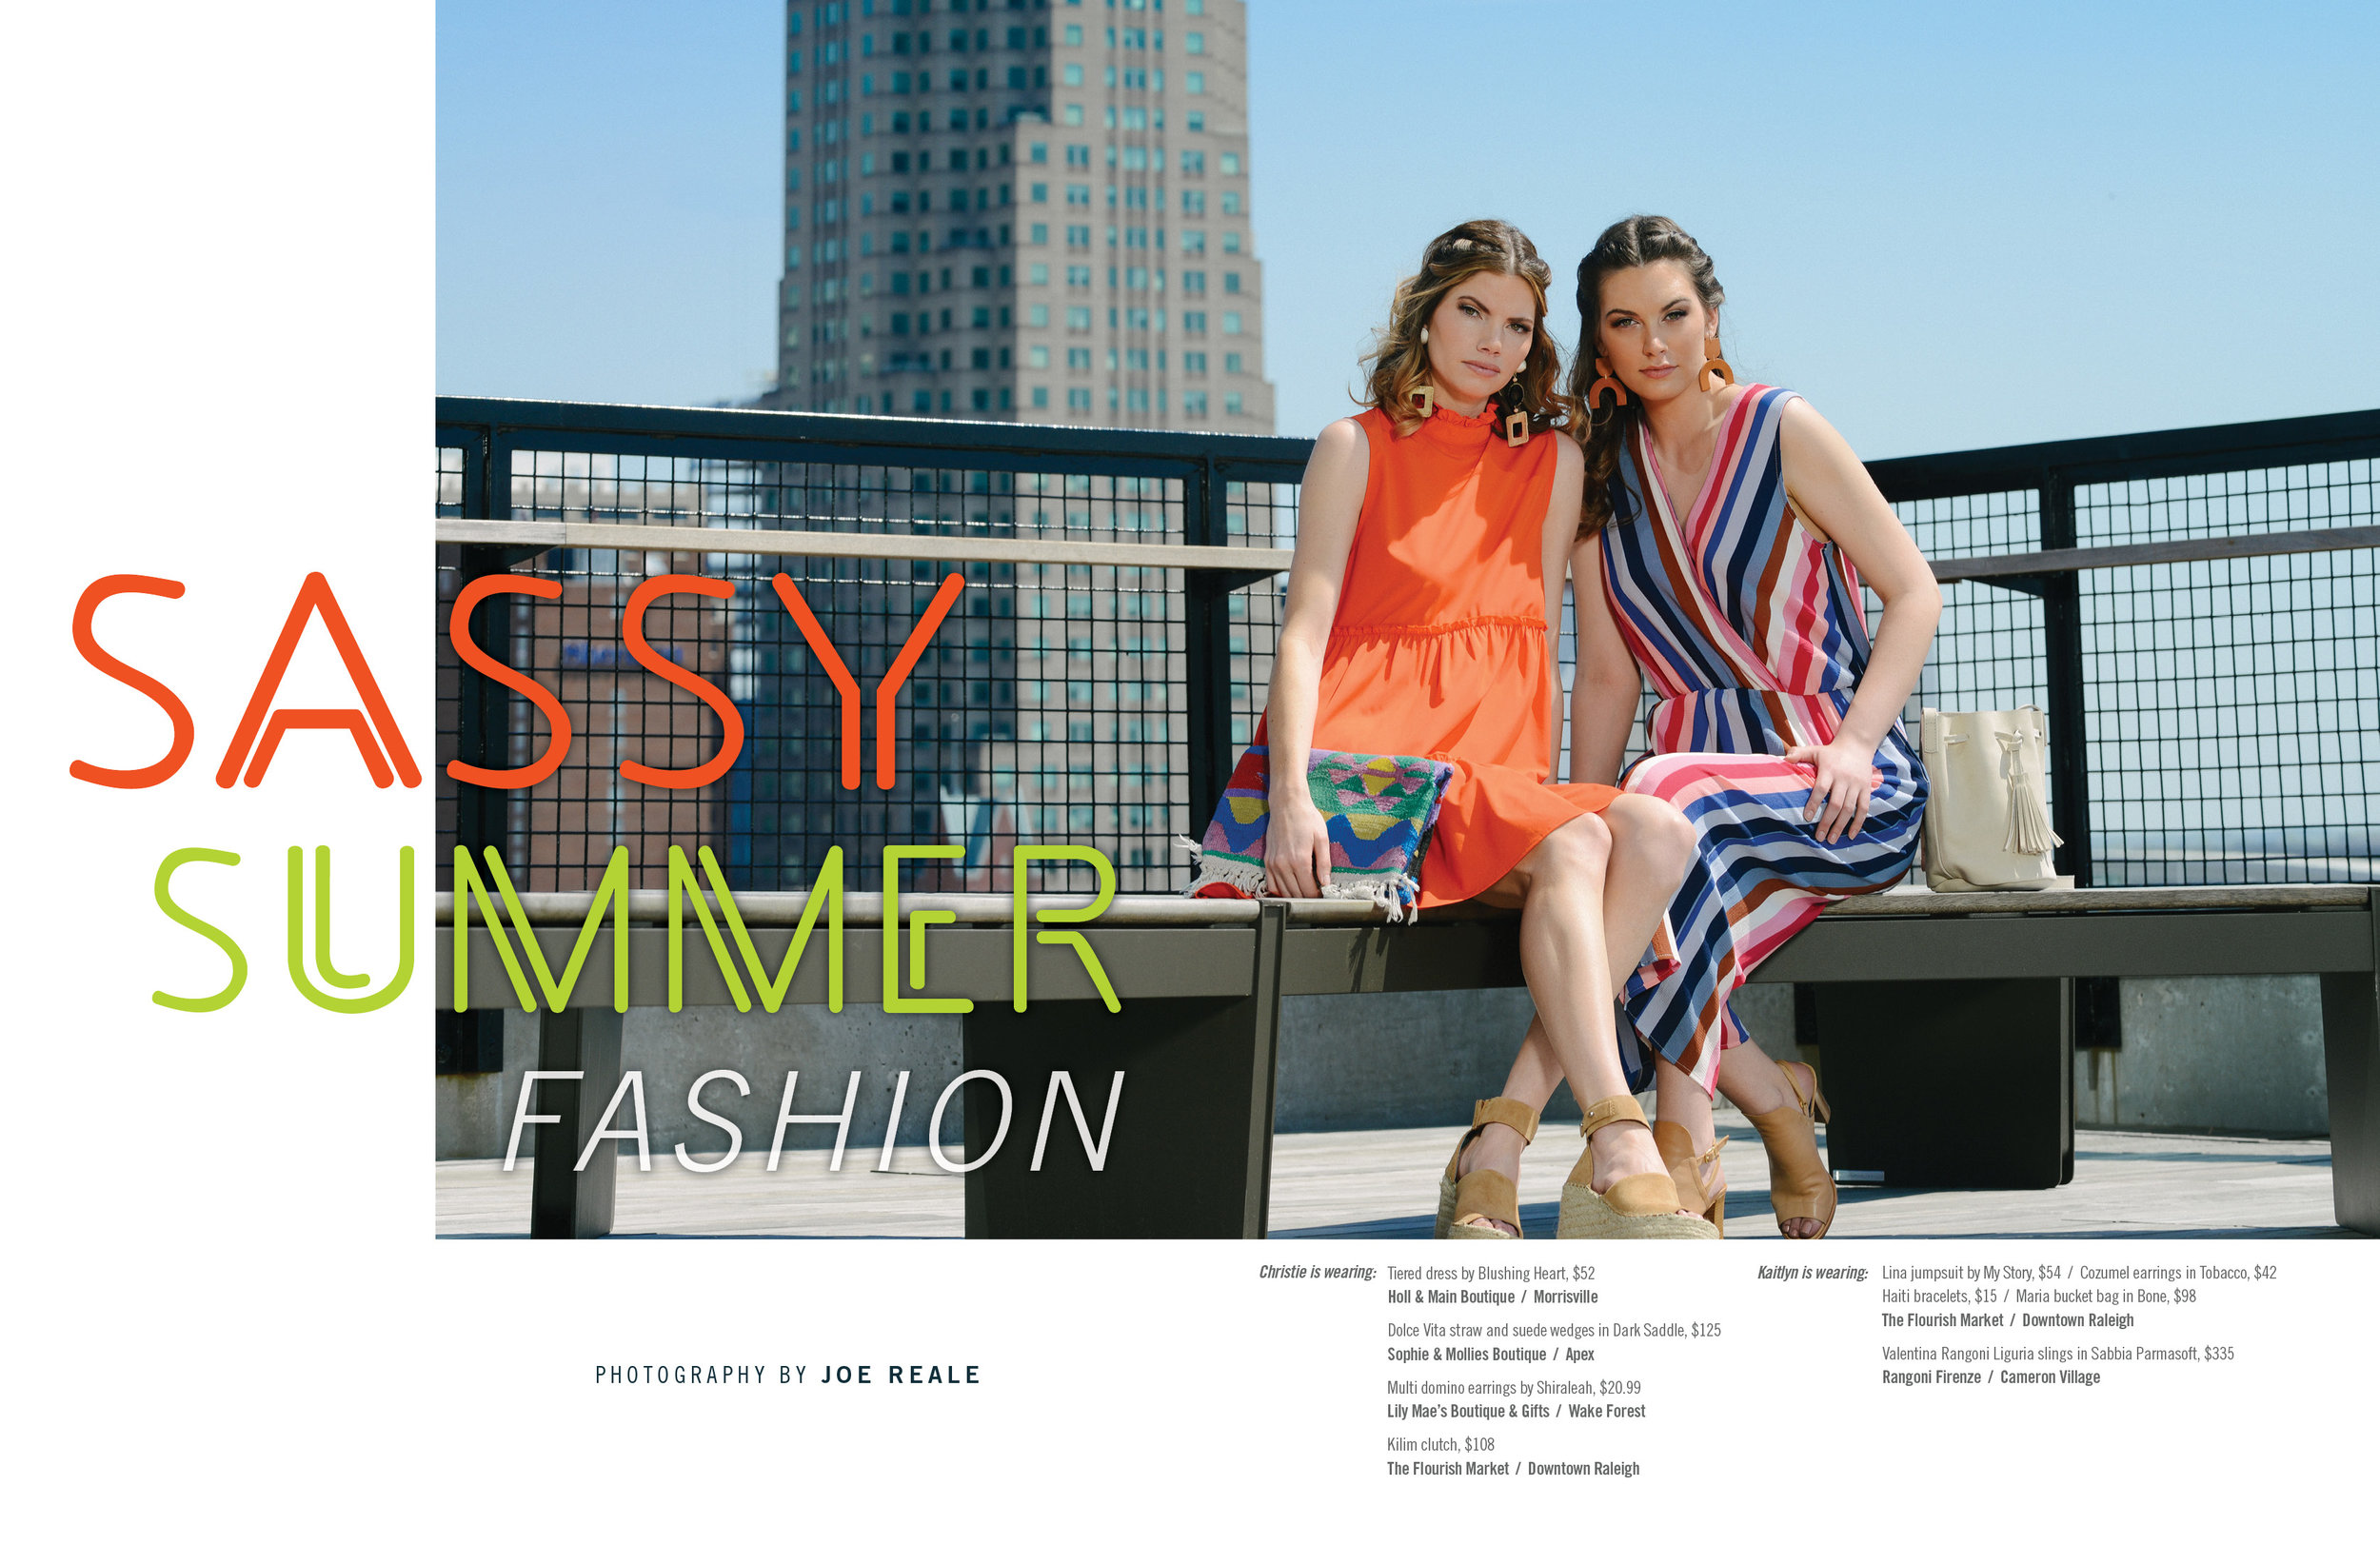 Sassy Summer Fashion-intro.jpg